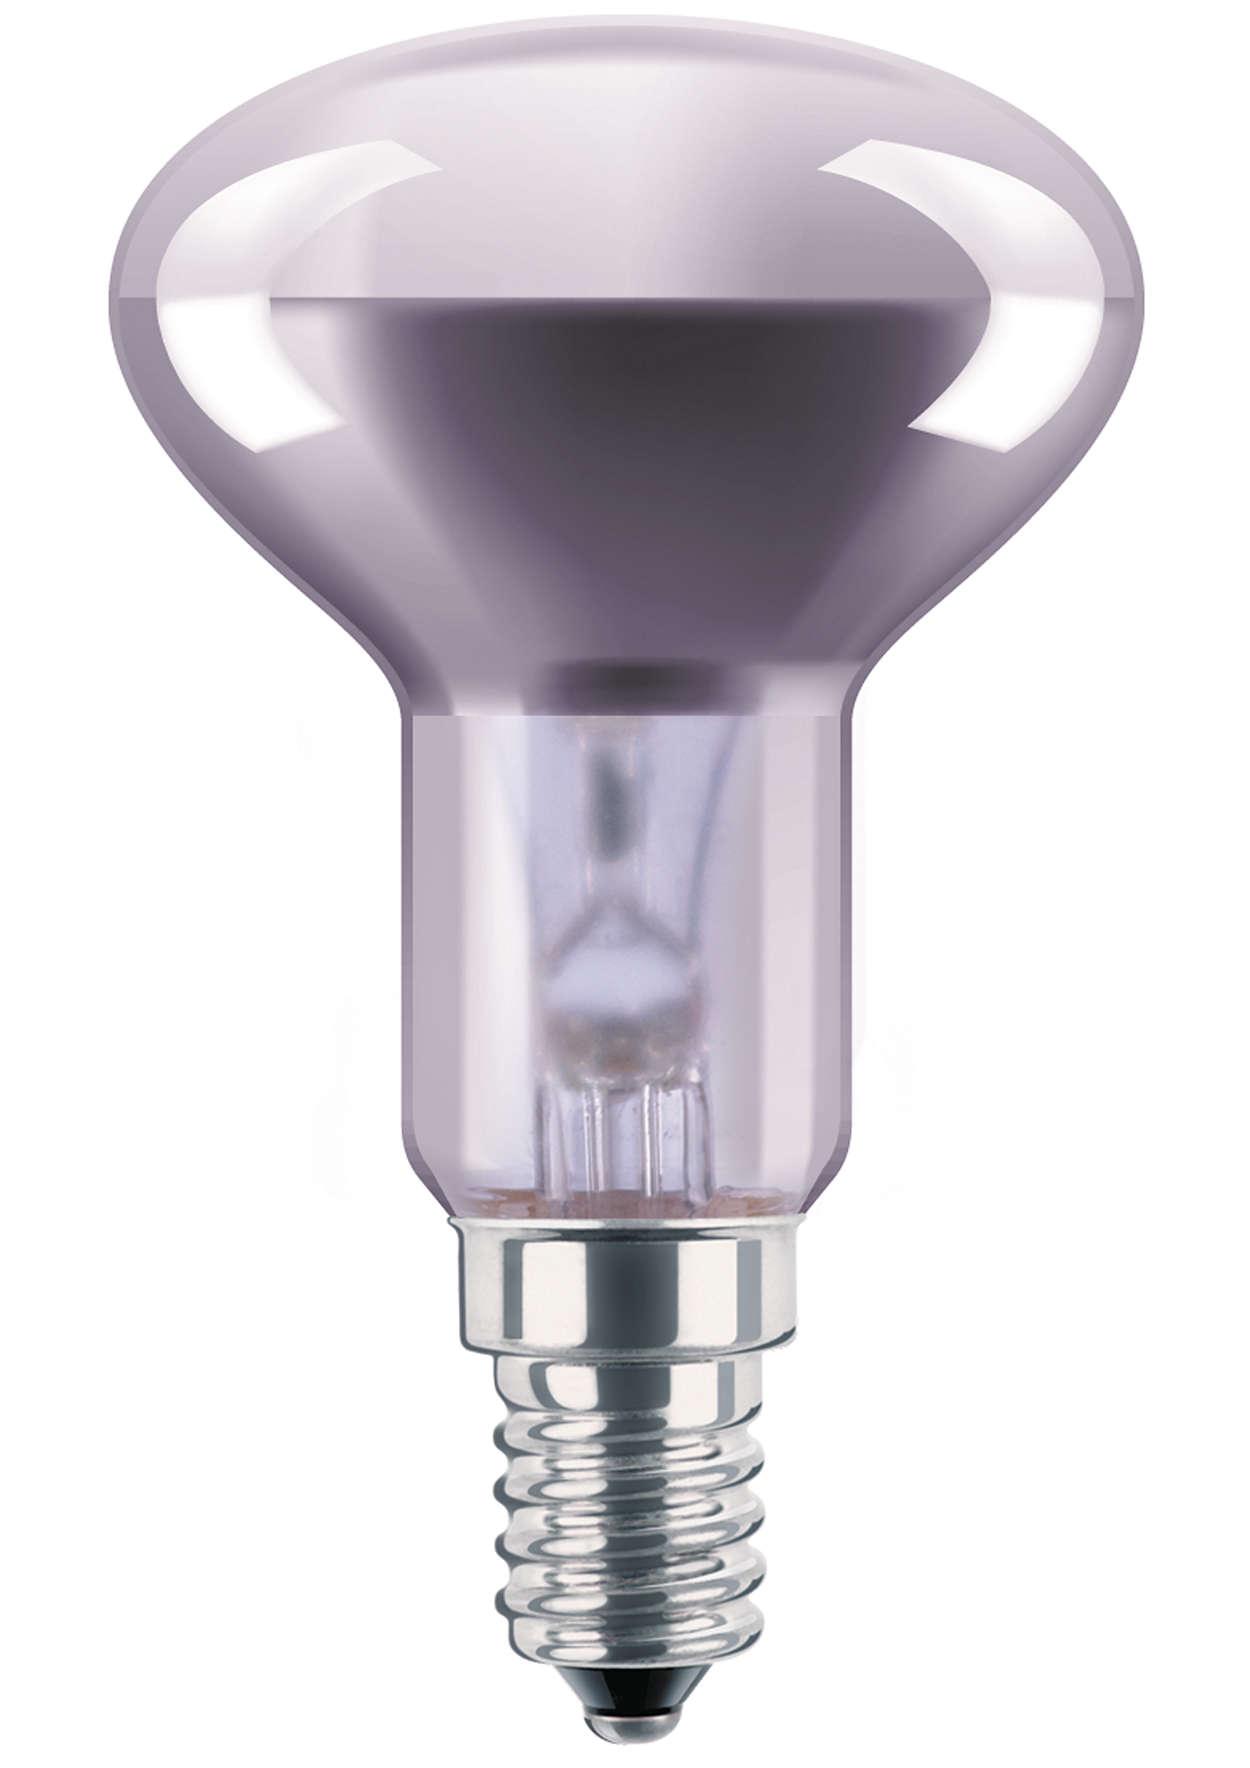 Reflektorlampa med neodymiumglaslampa